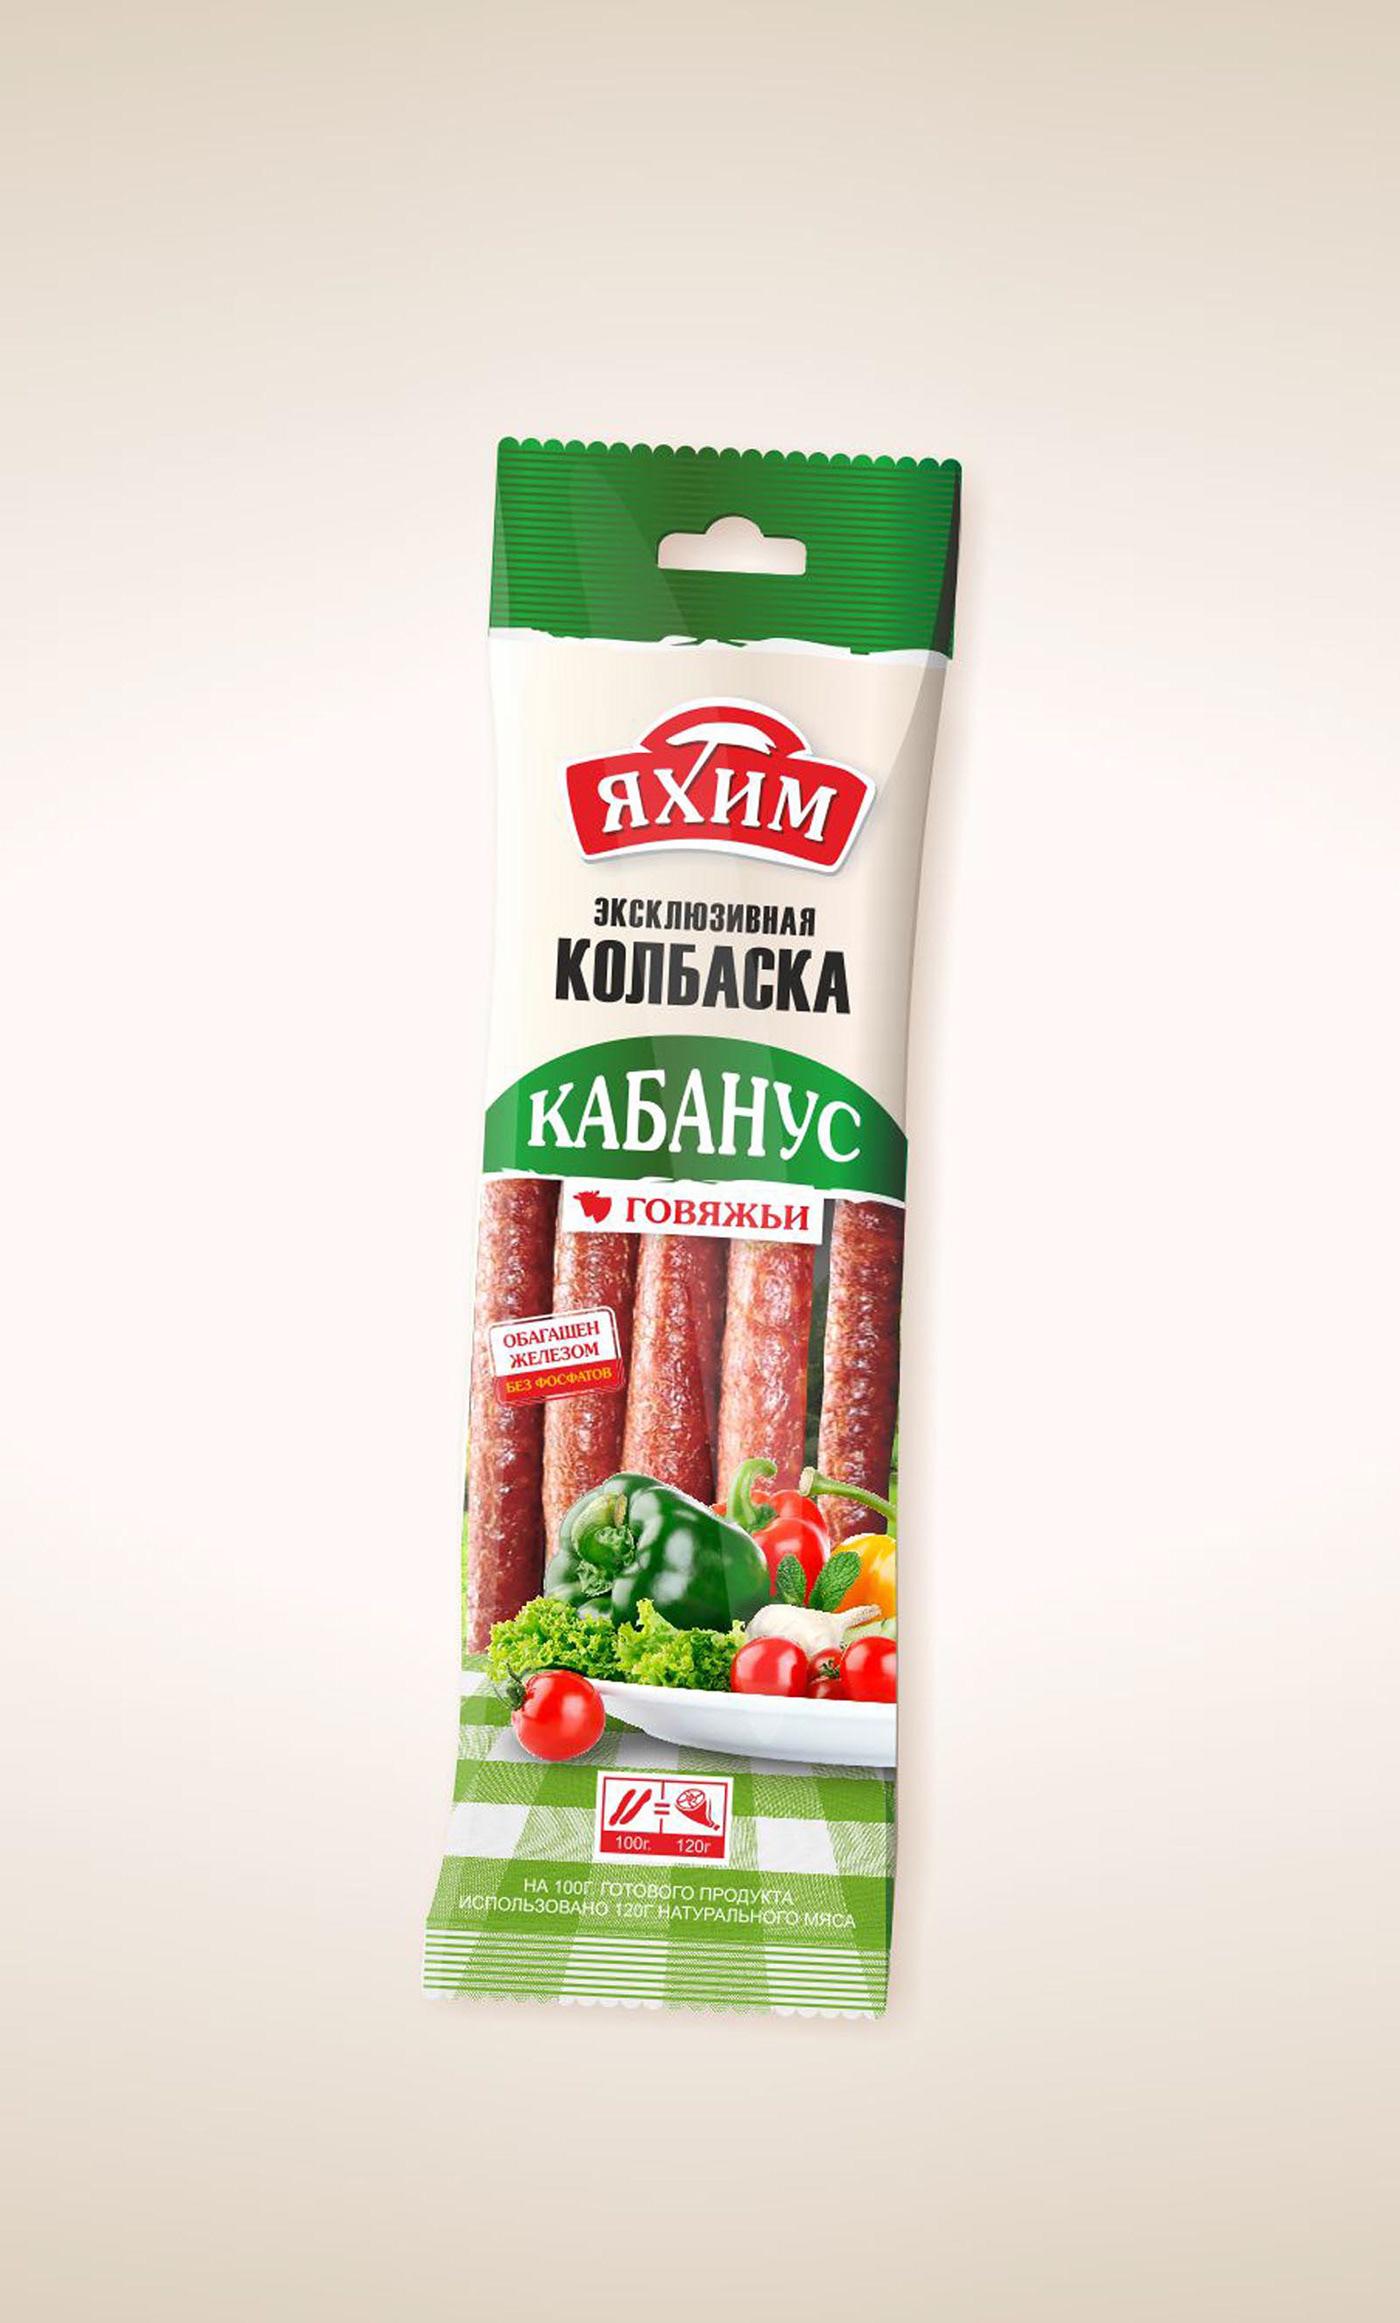 Продукт мясо Бакалея колбаса